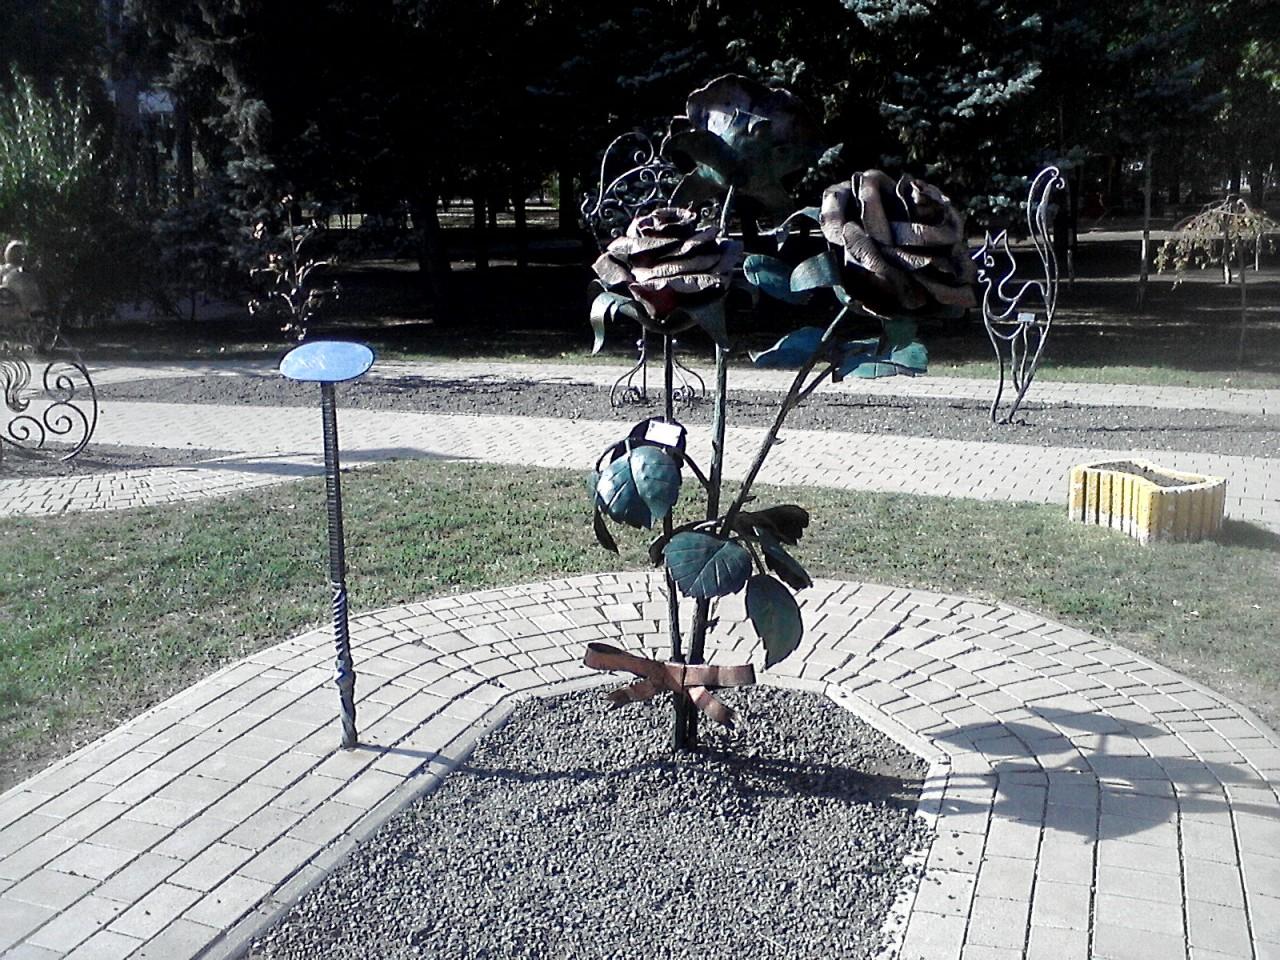 Донецк – осенняя сказка и реальная боль